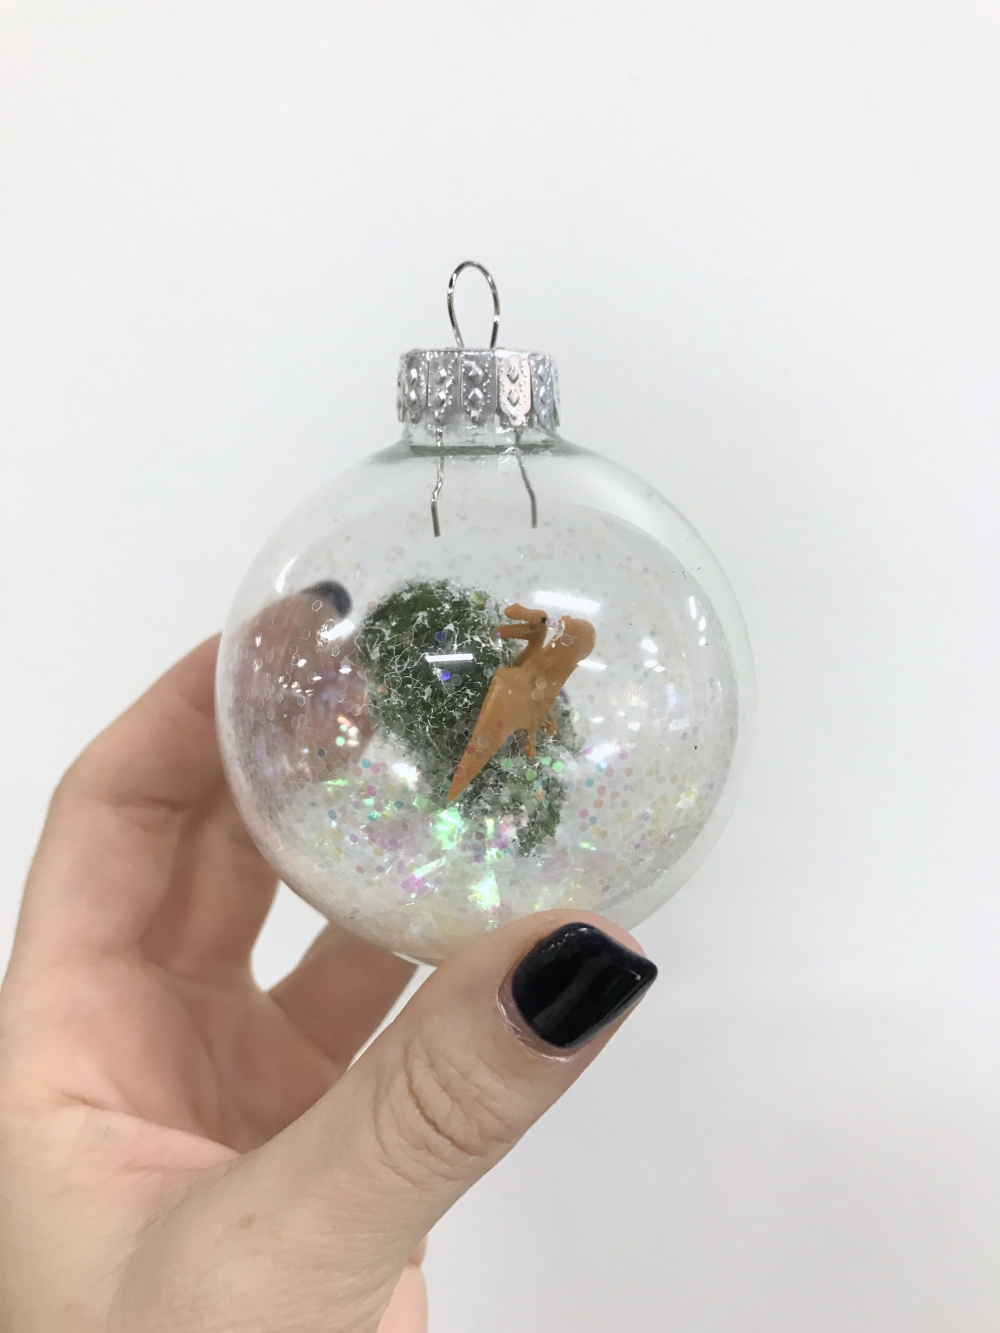 finished-snowglobe-ornament-diy-pop-shop-america